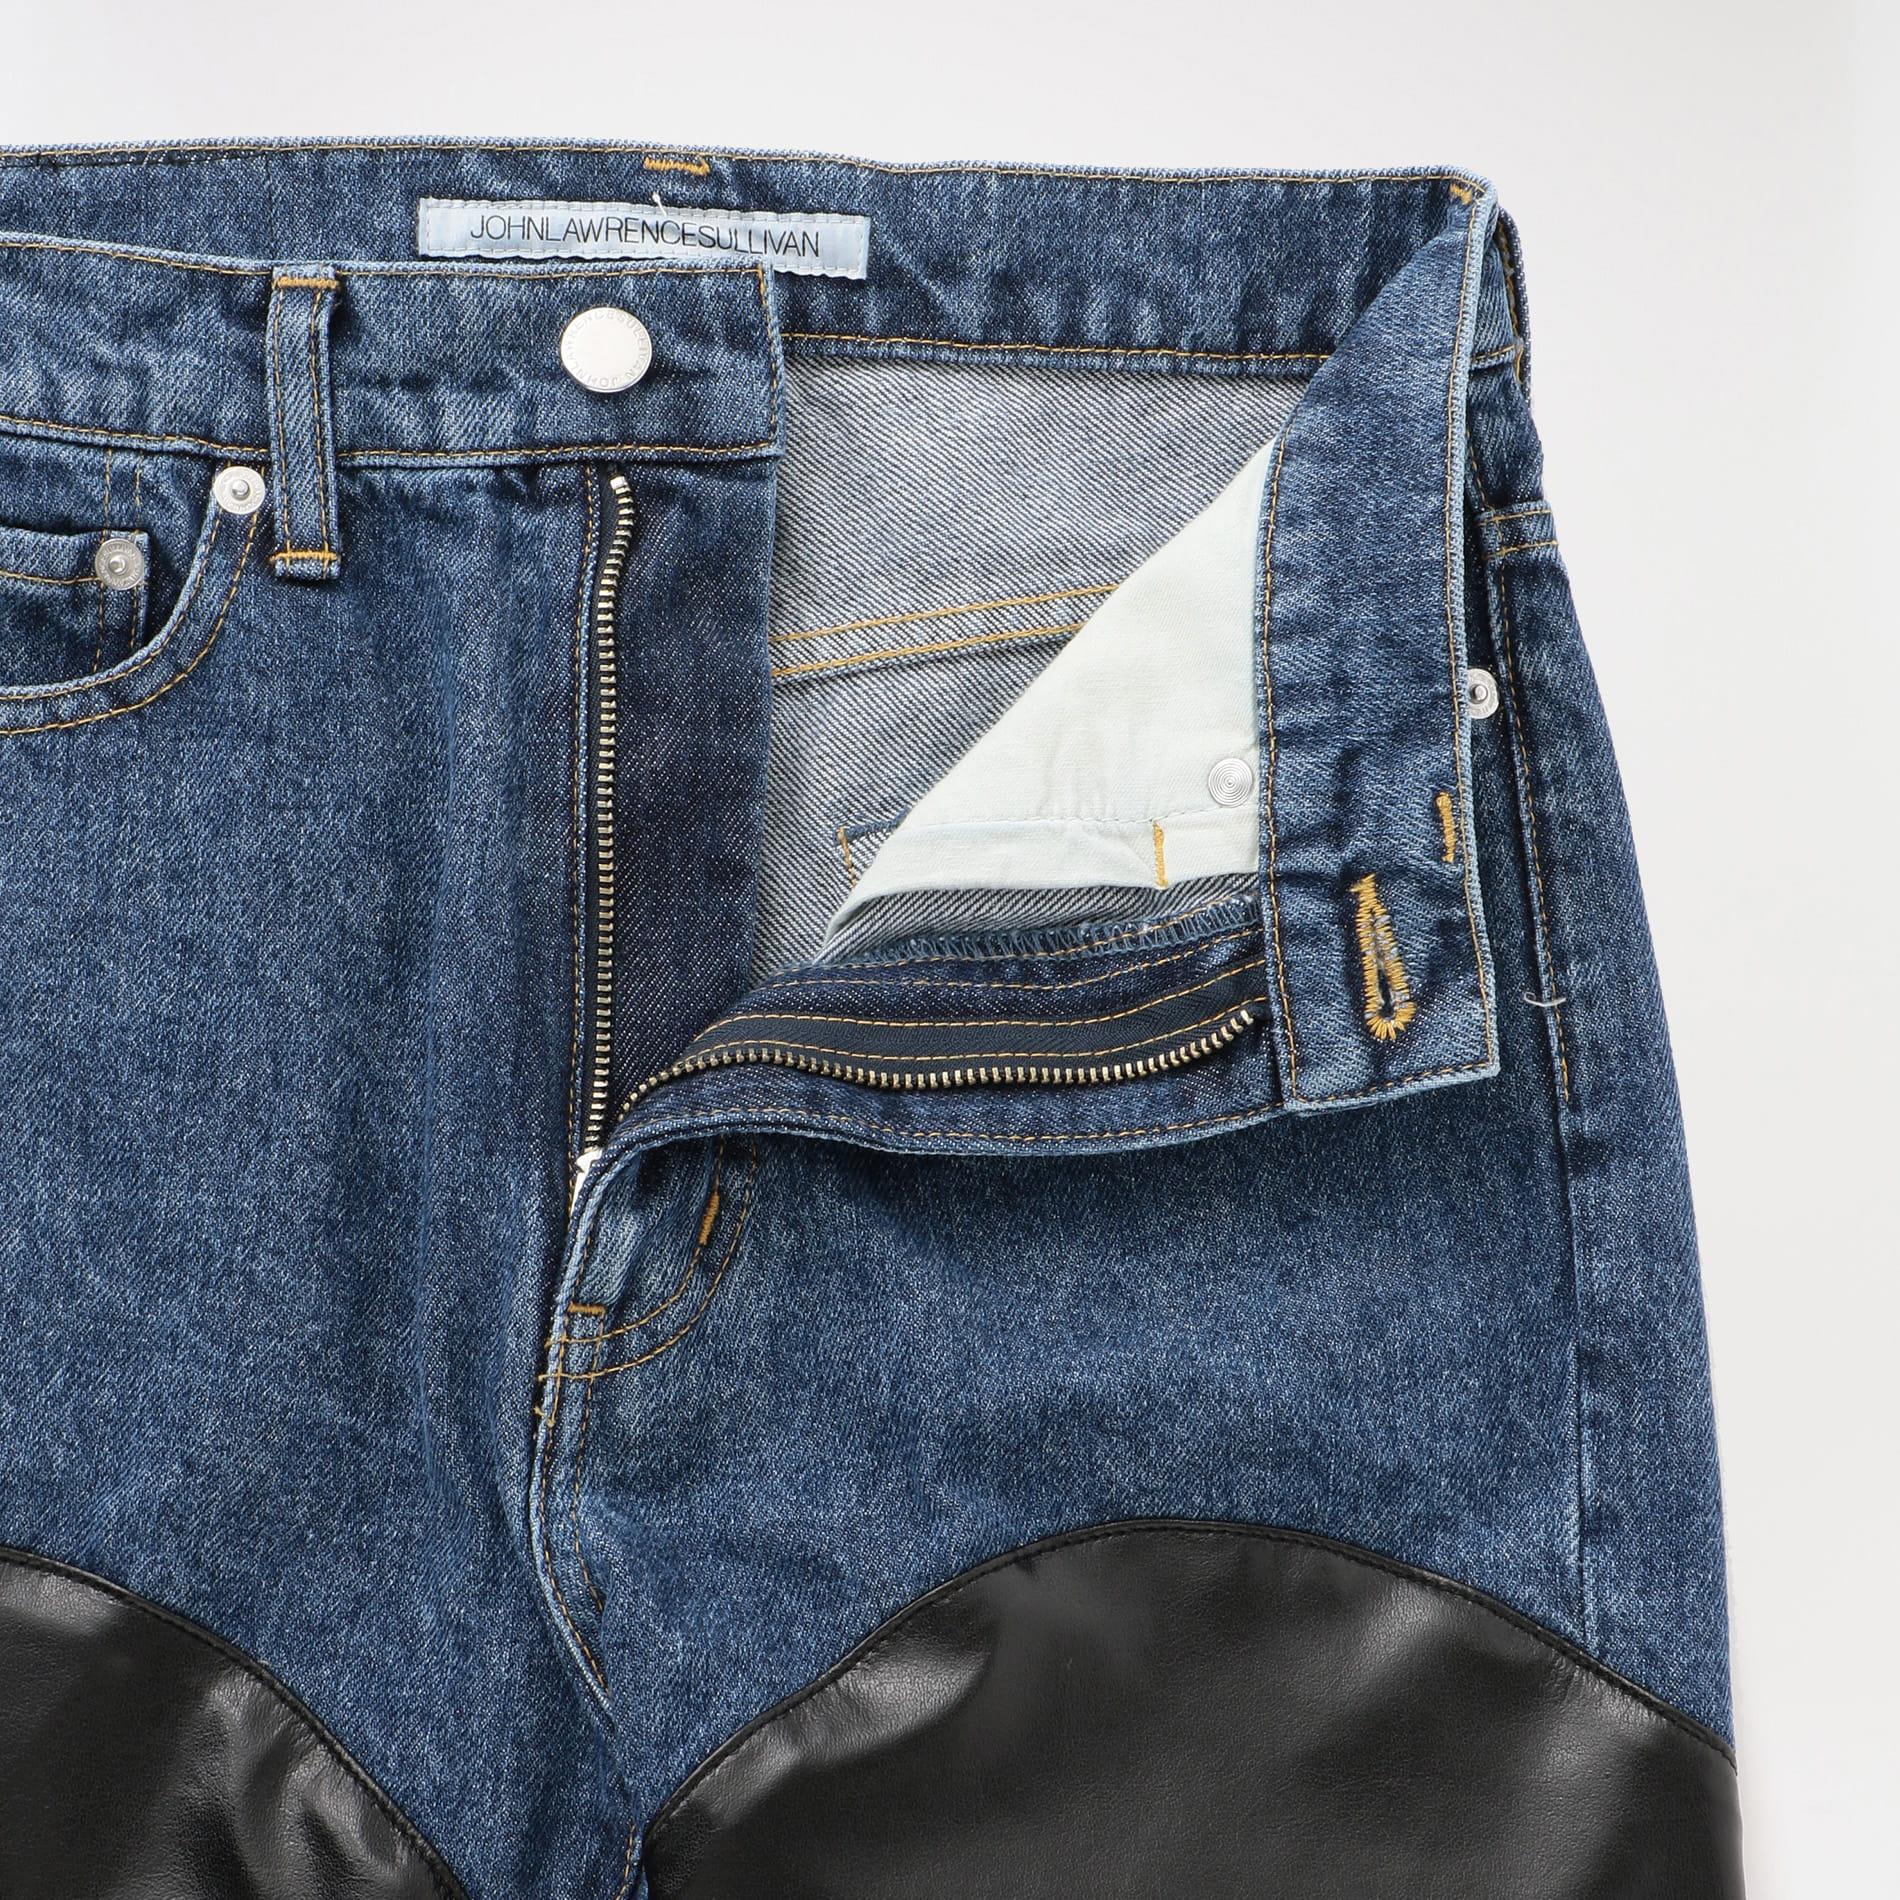 【JOHN LAWRENCE SULLIVAN】WOMEN Denim & Fake Leathercombi Color Pants JLSW-38